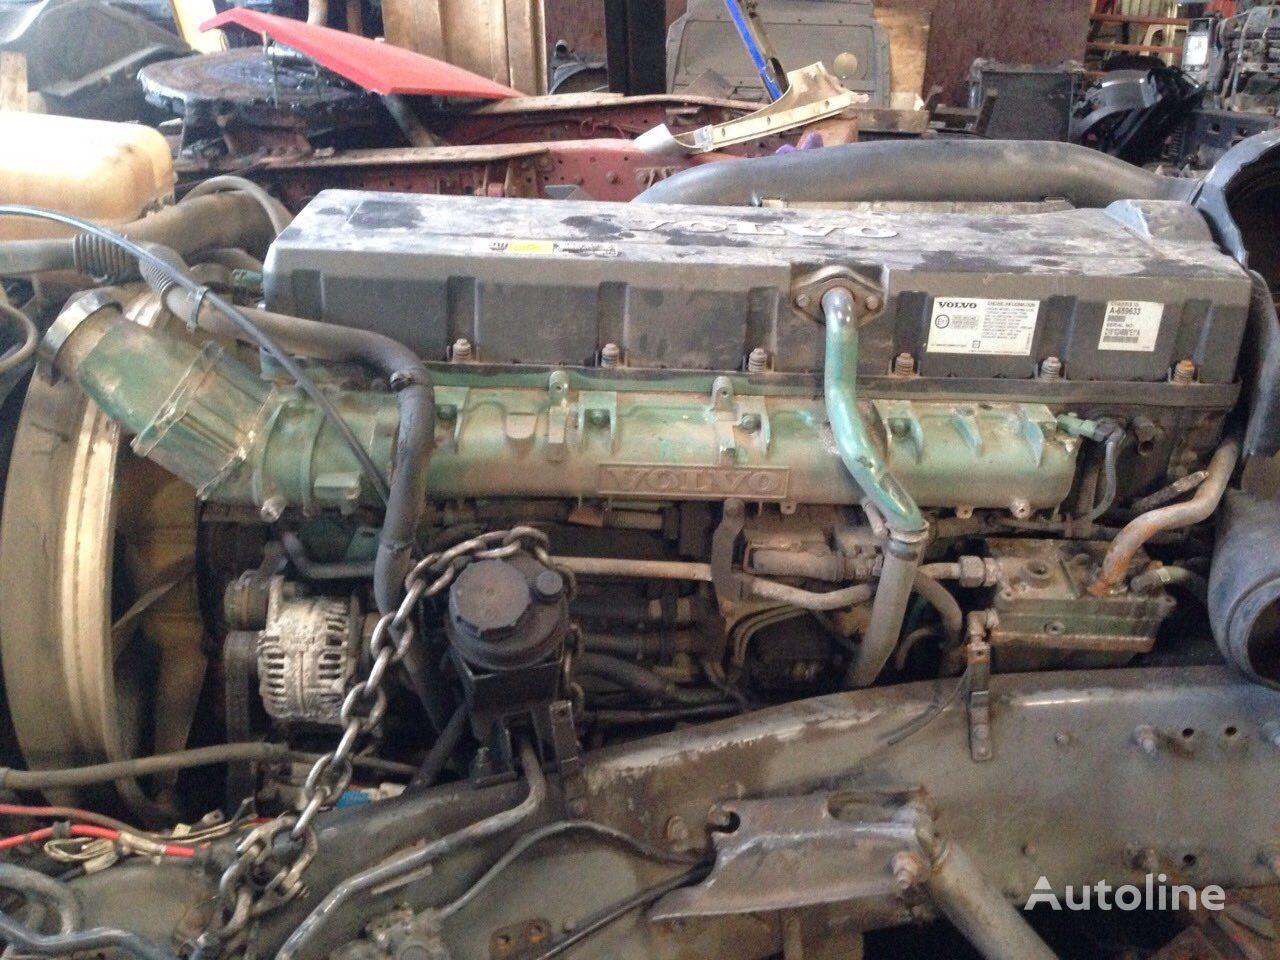 VOLVO FH16 D16E engine, EURO5, EURO4 emission D16E660 EC06, 660PS, 485 engine for VOLVO FH16 tractor unit